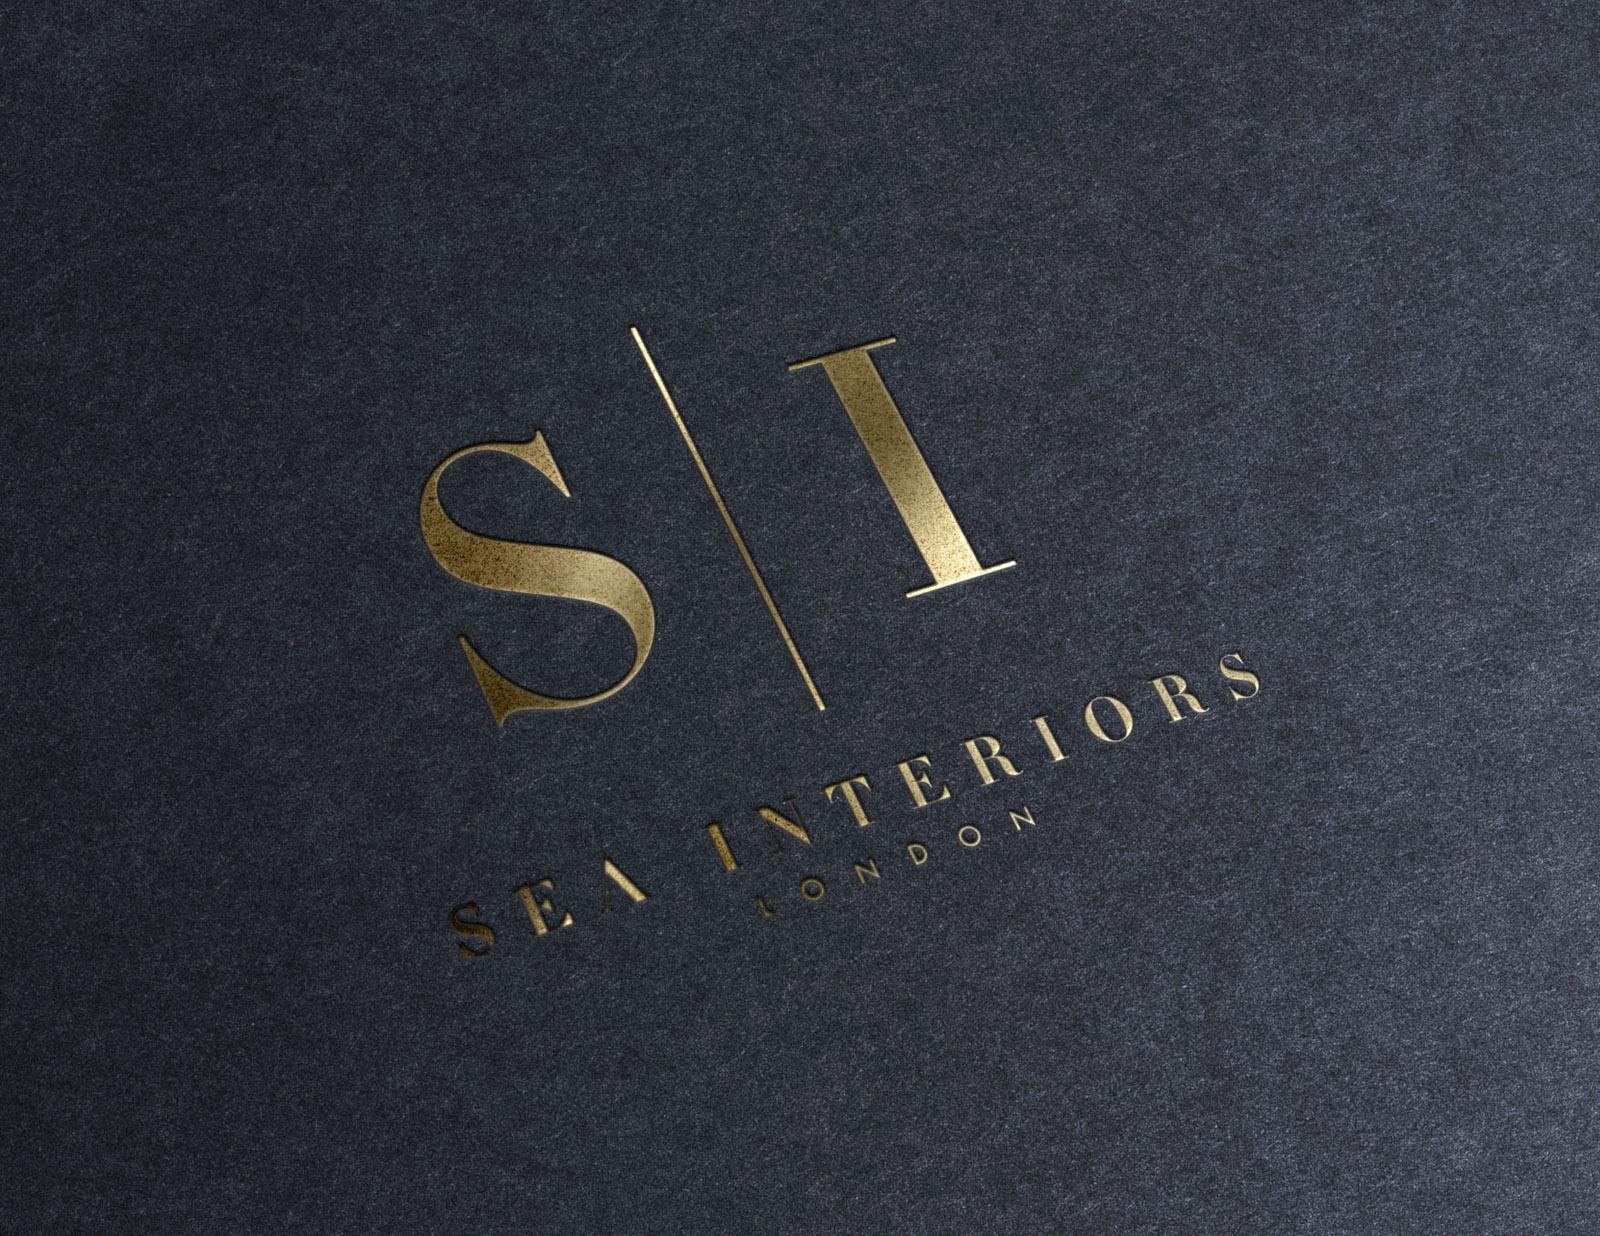 Interior Design Branding and Identity Design Project London